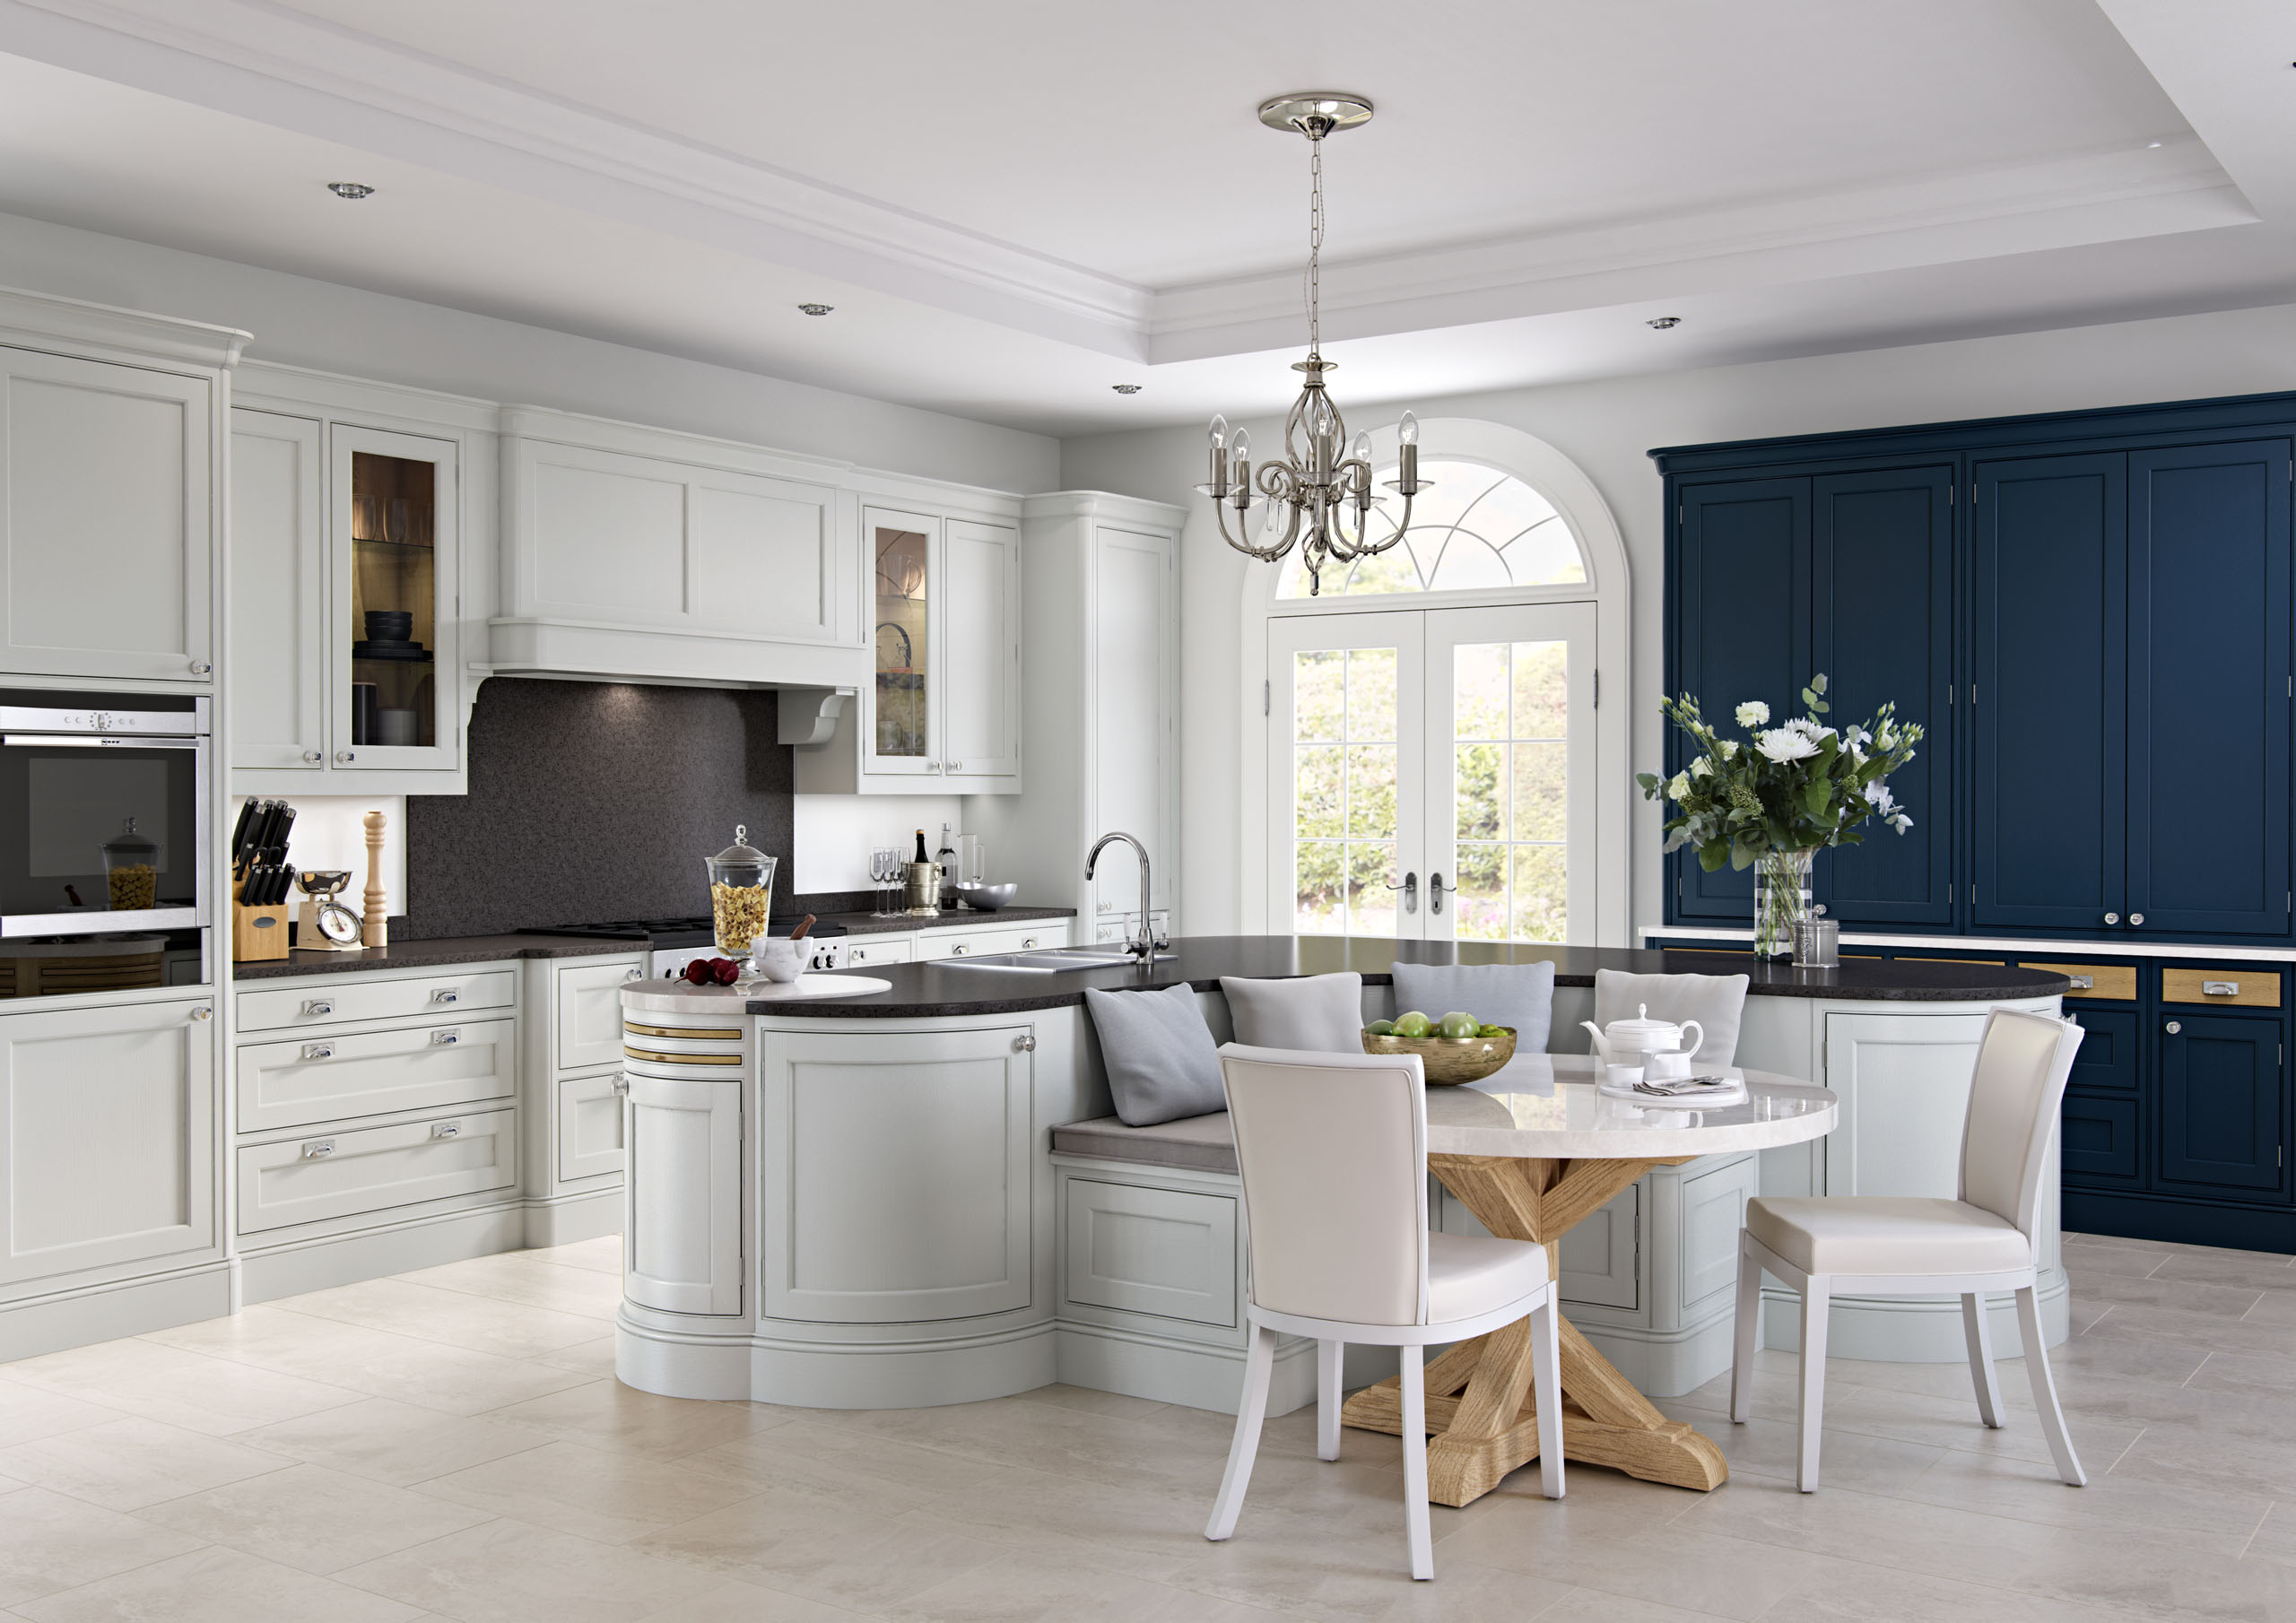 Rougemont kitchen Crestwood of Lymington